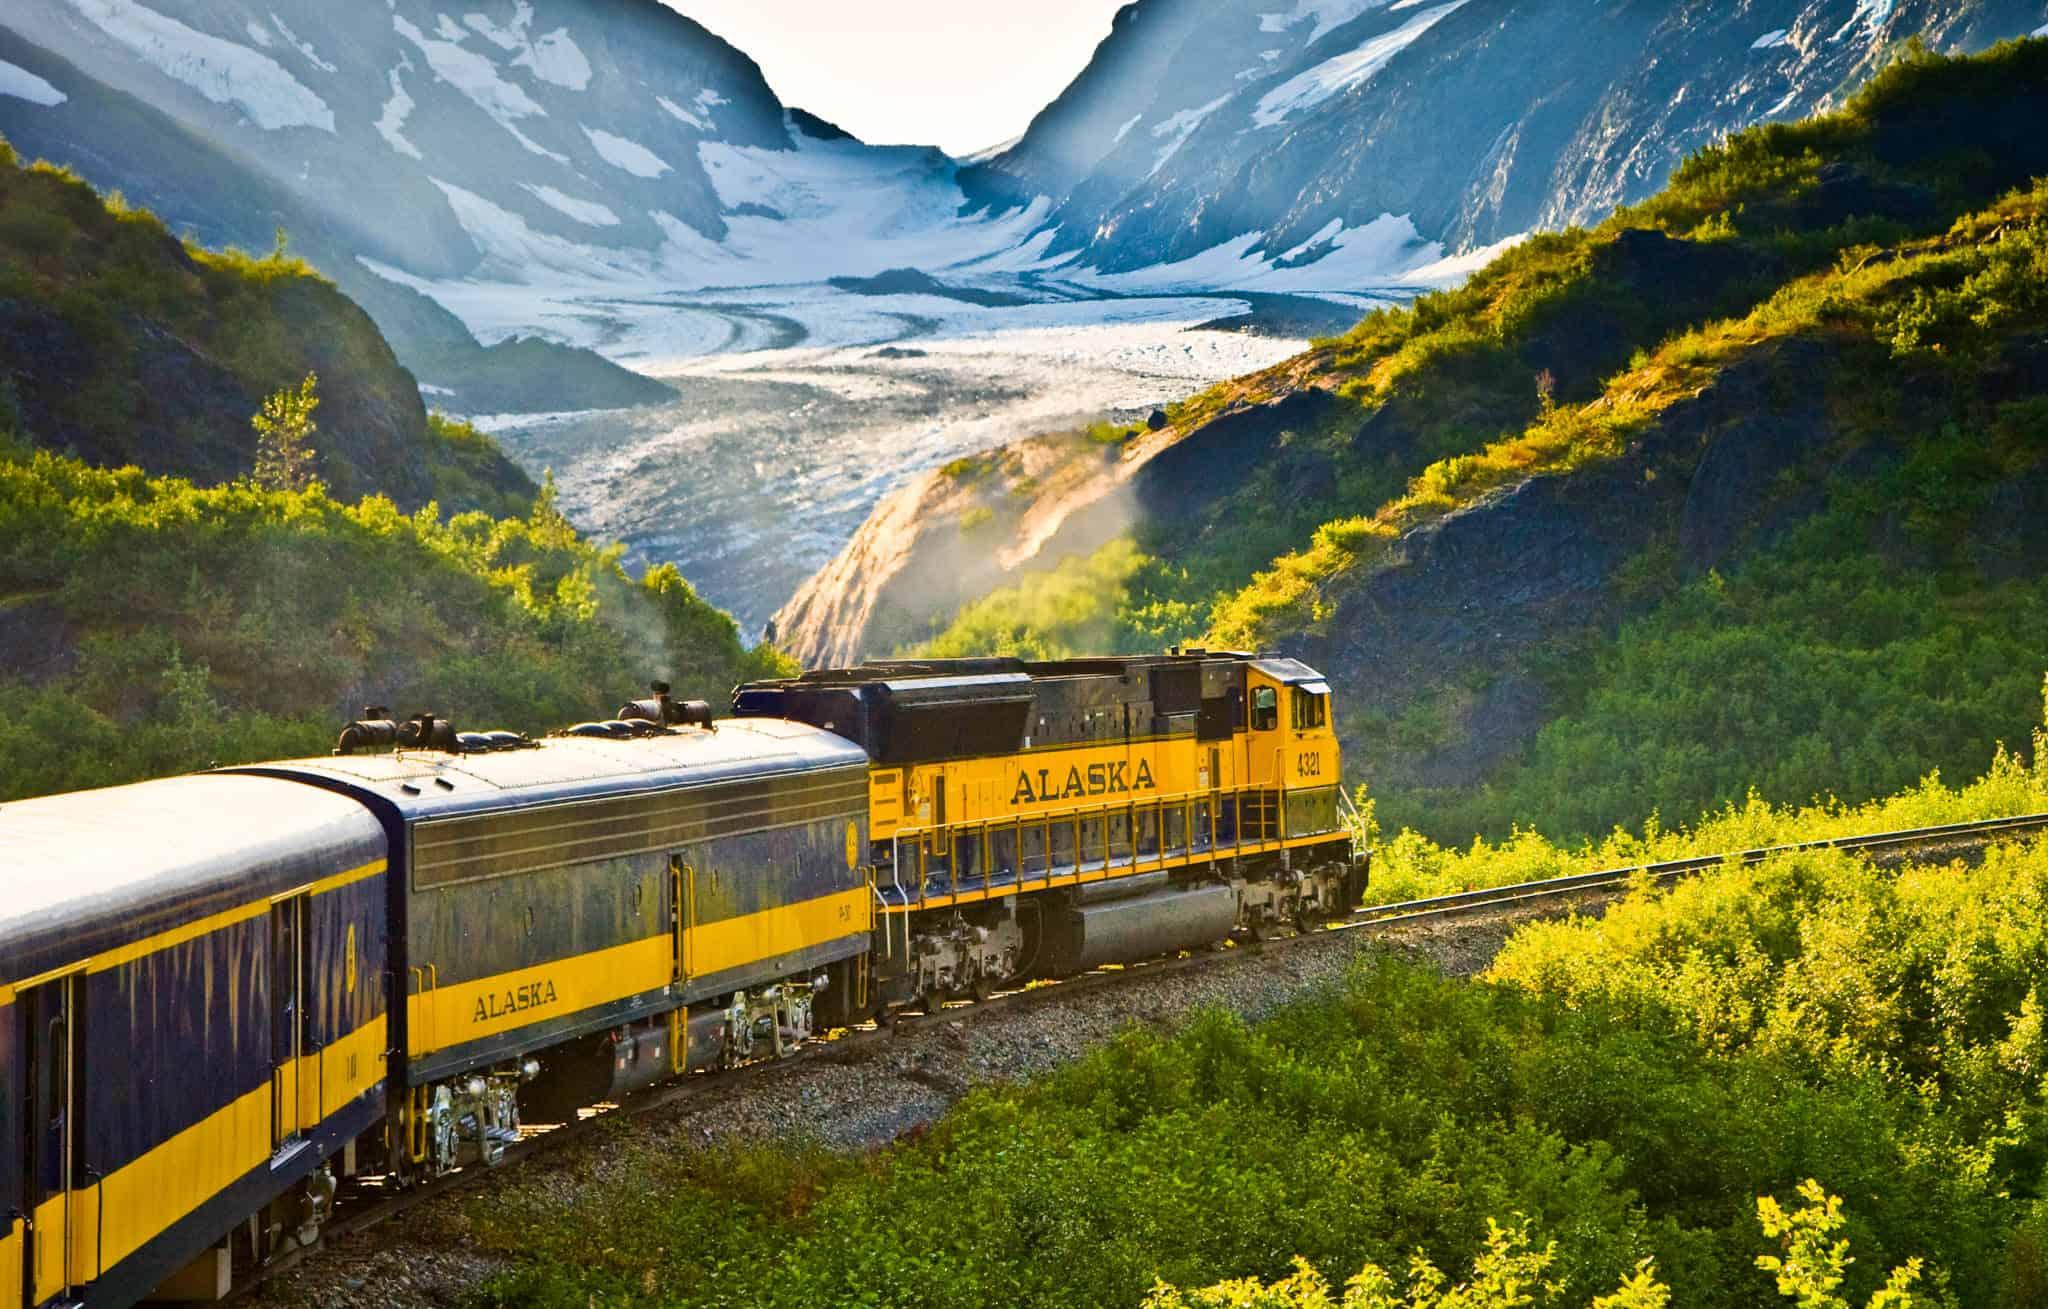 Alaska Railroad trains